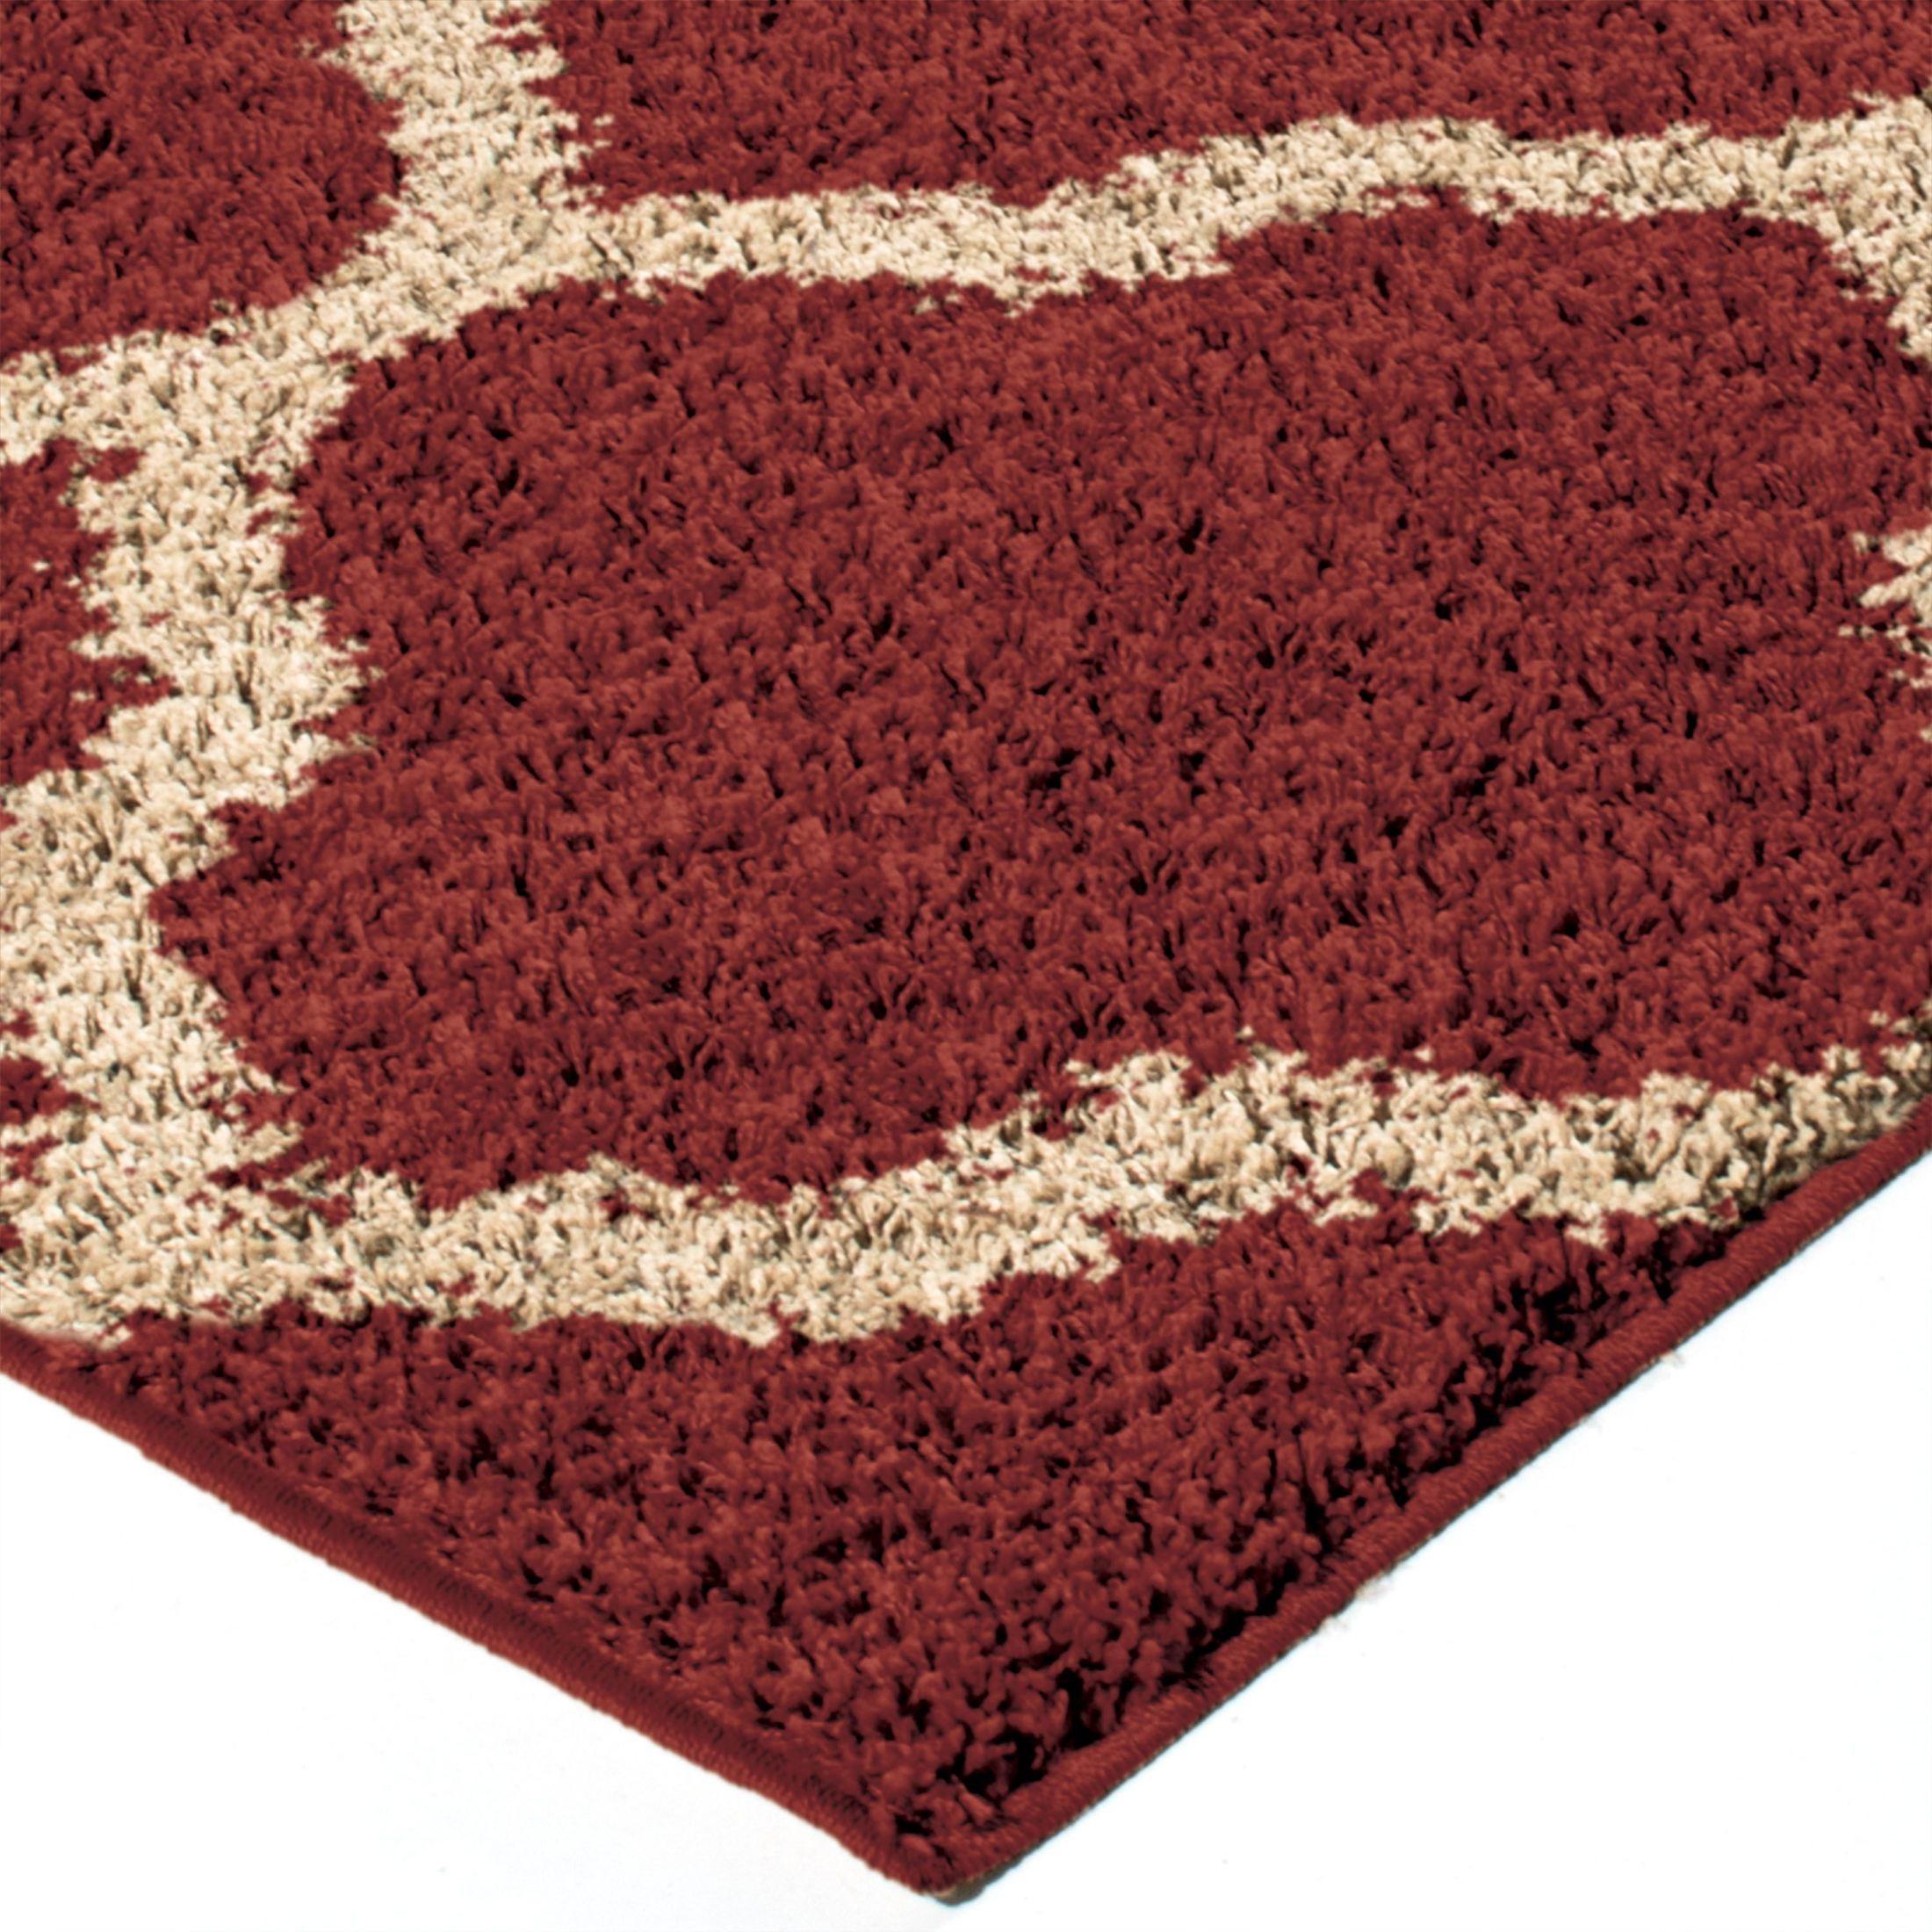 Orian Rugs Plush Trellis Malton Red Area Large Rug, 3713